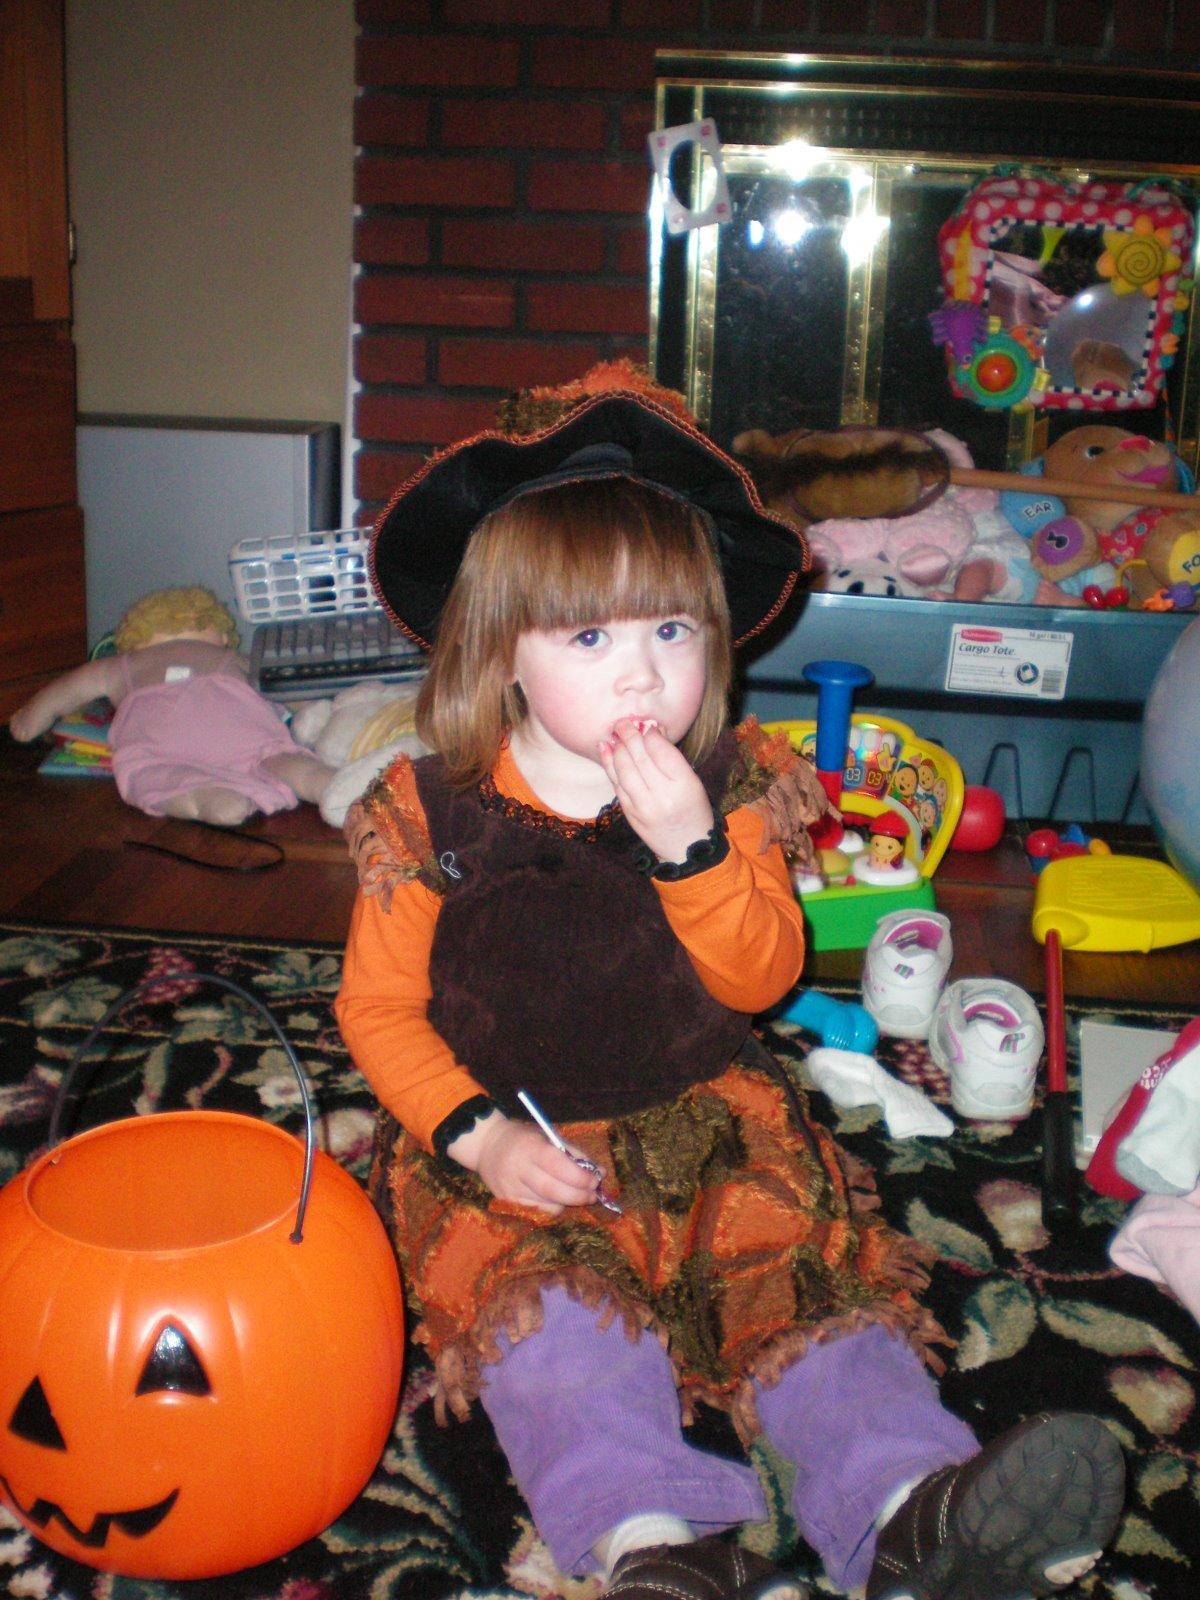 [Fiona+halloween+2]